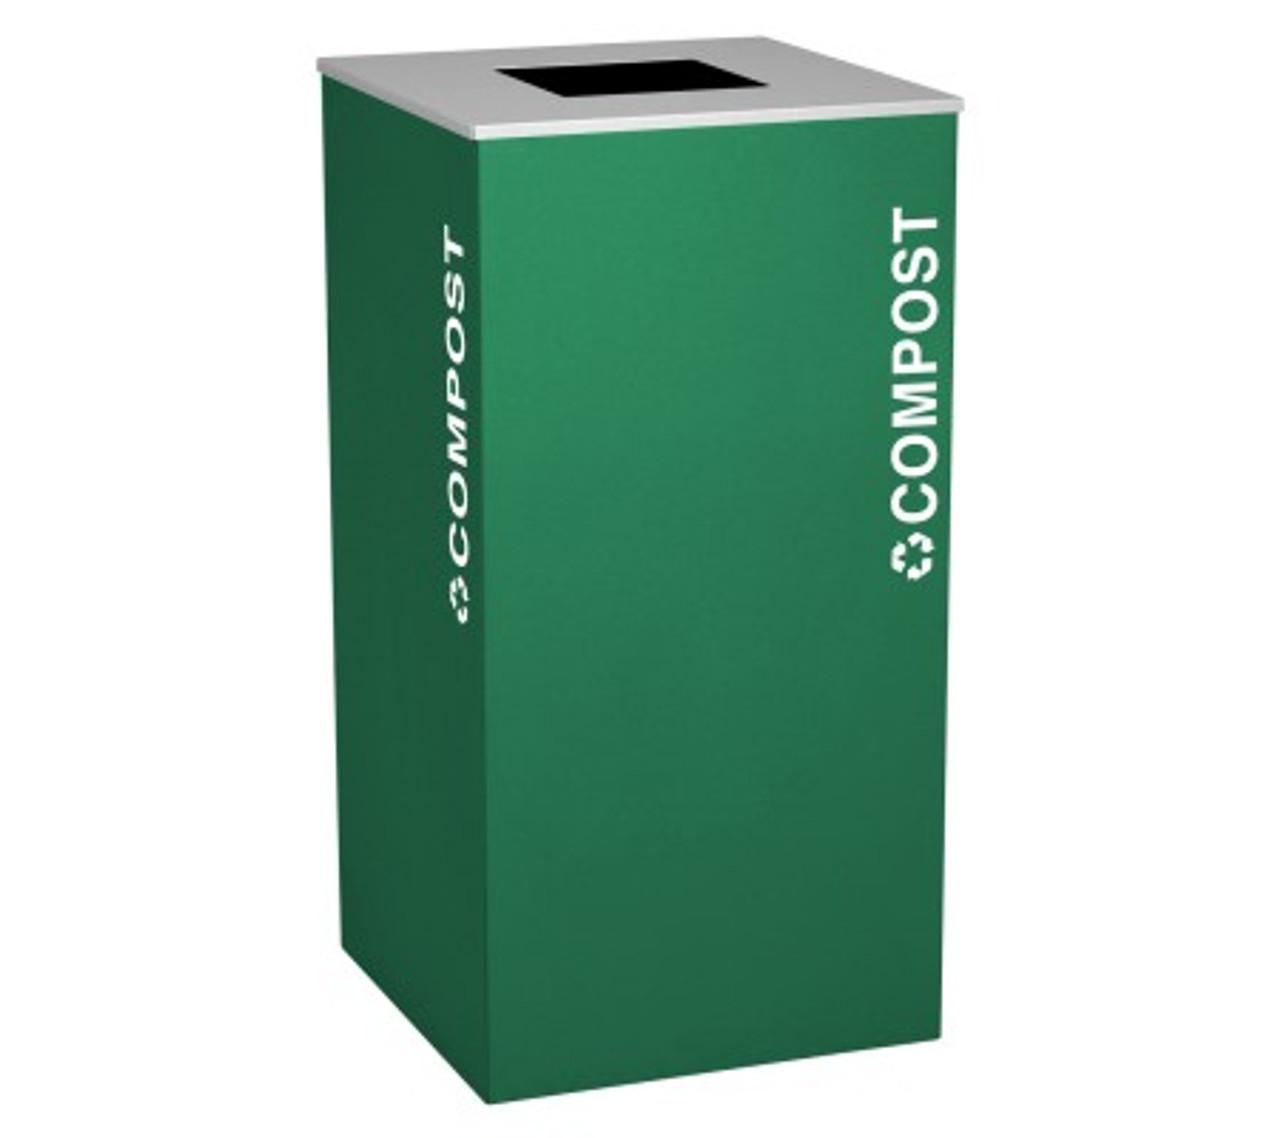 24 Gallon Compost Bin Square Steel Food Waste Can RC-KDSQ-CMPST EGX Emerald Green